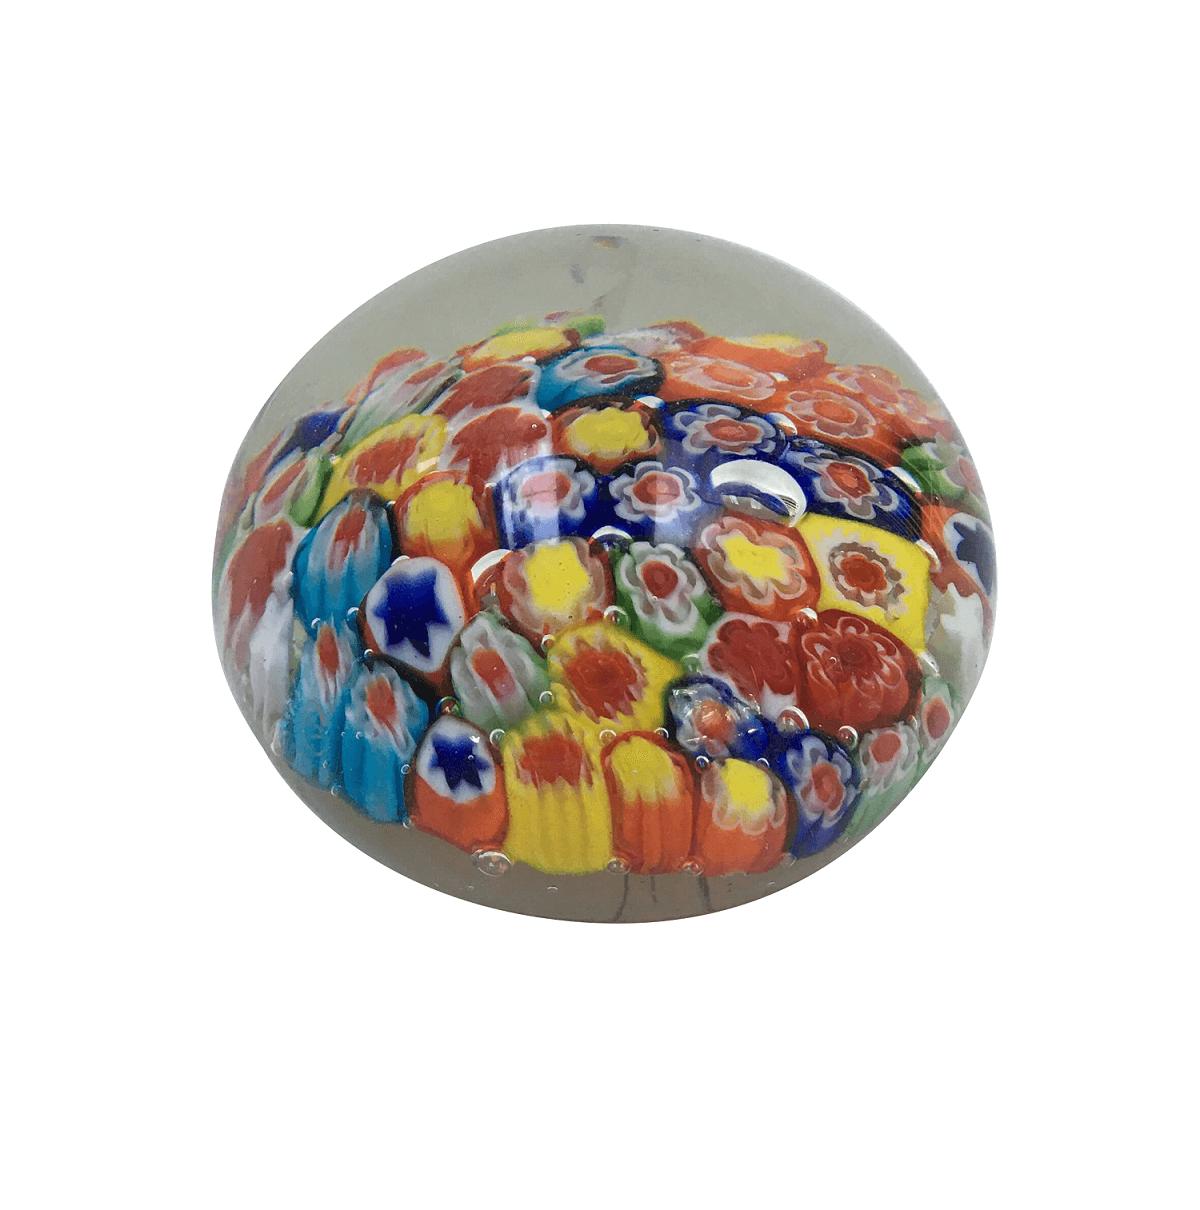 Peso De Murano Bola Flores Coloridas